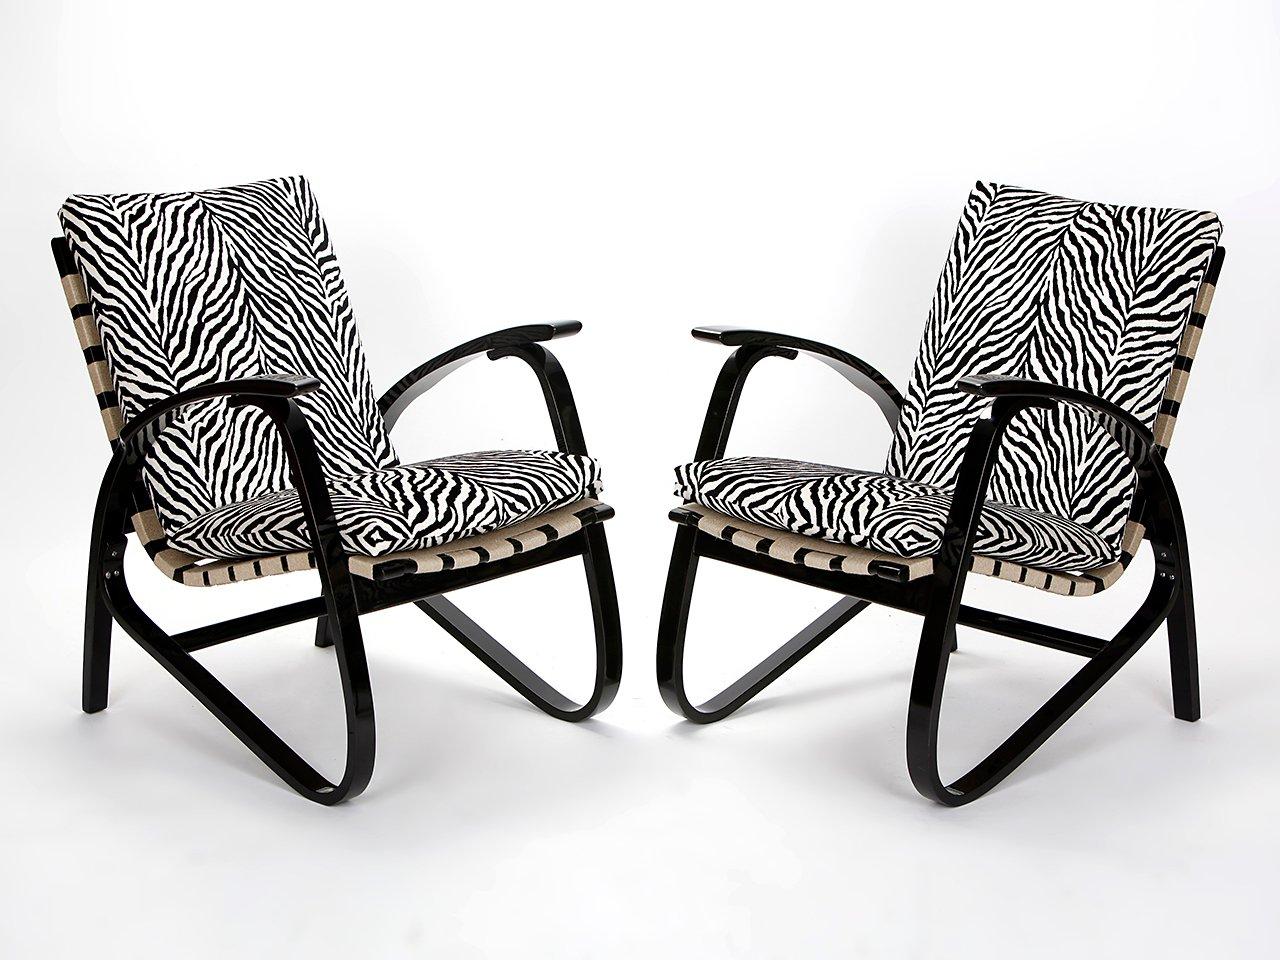 Vintage Zebradruck Sessel von Jan Vanek, 1935, 2er Set